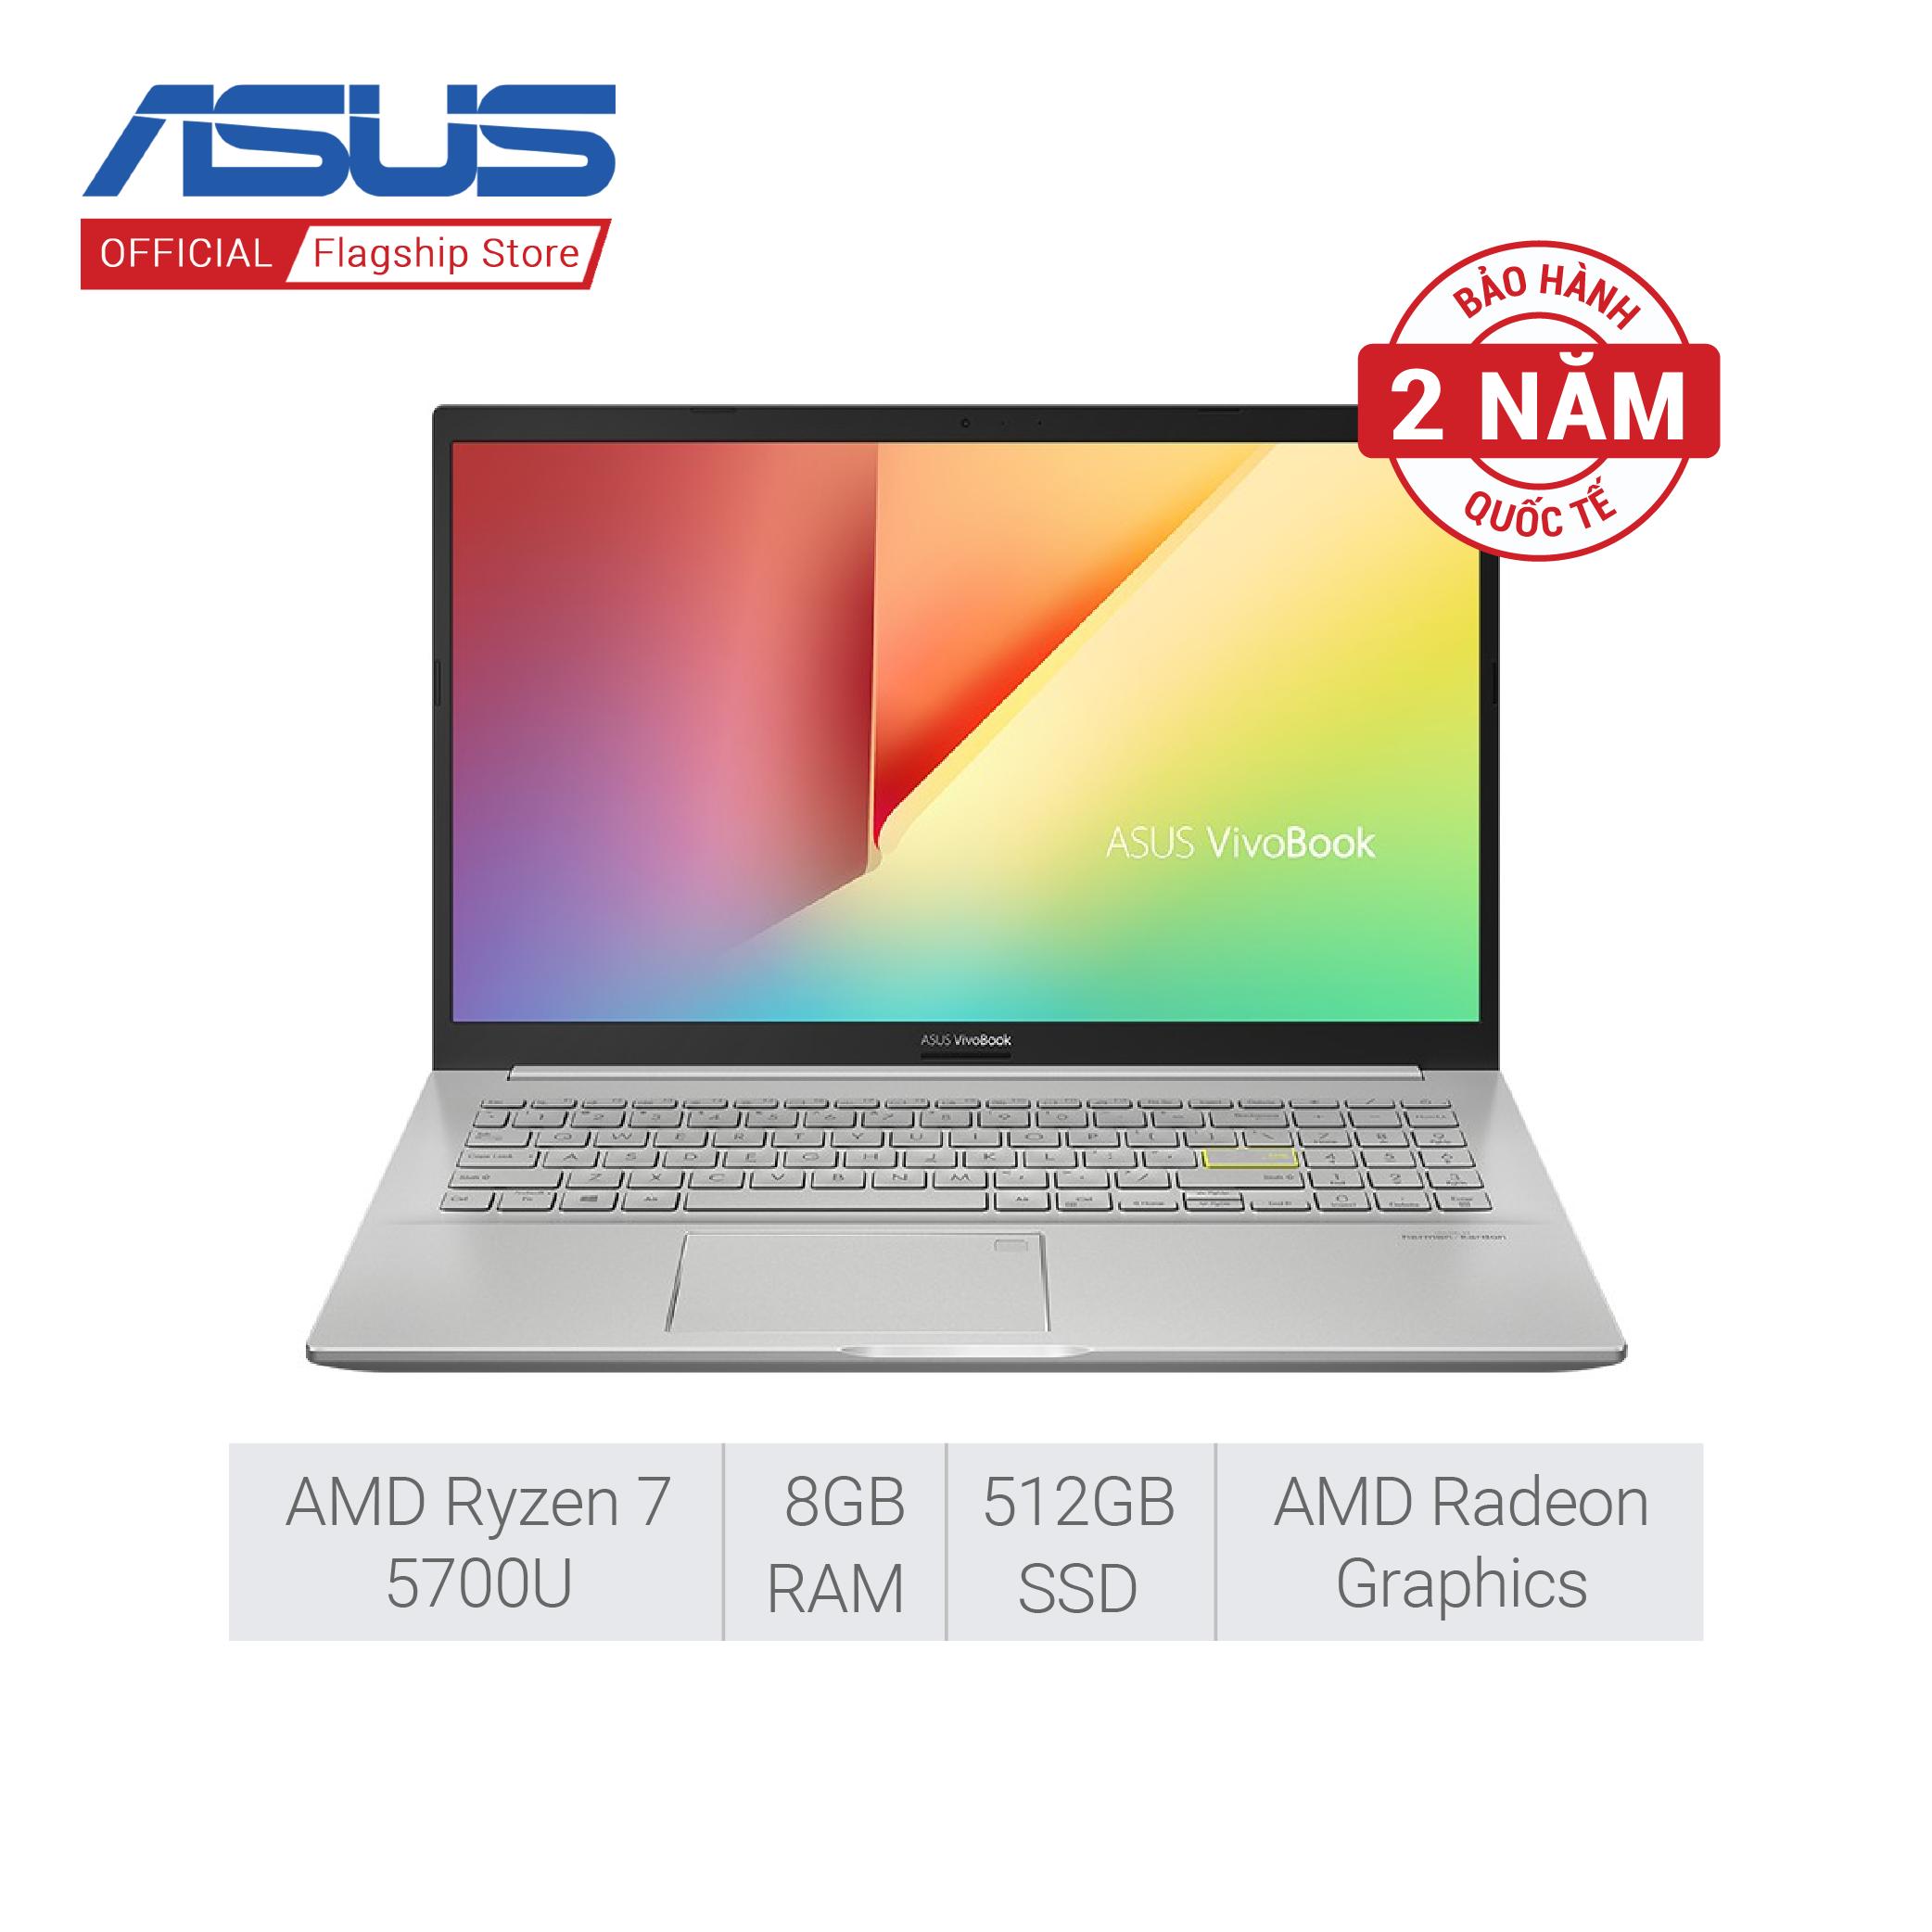 [Trả góp 0%]Laptop ASUS VivoBook M513UA-EJ033T | R7-5700U | 8GB | 512GB SSD | AMD Radeon Graphics| 15.6 inch